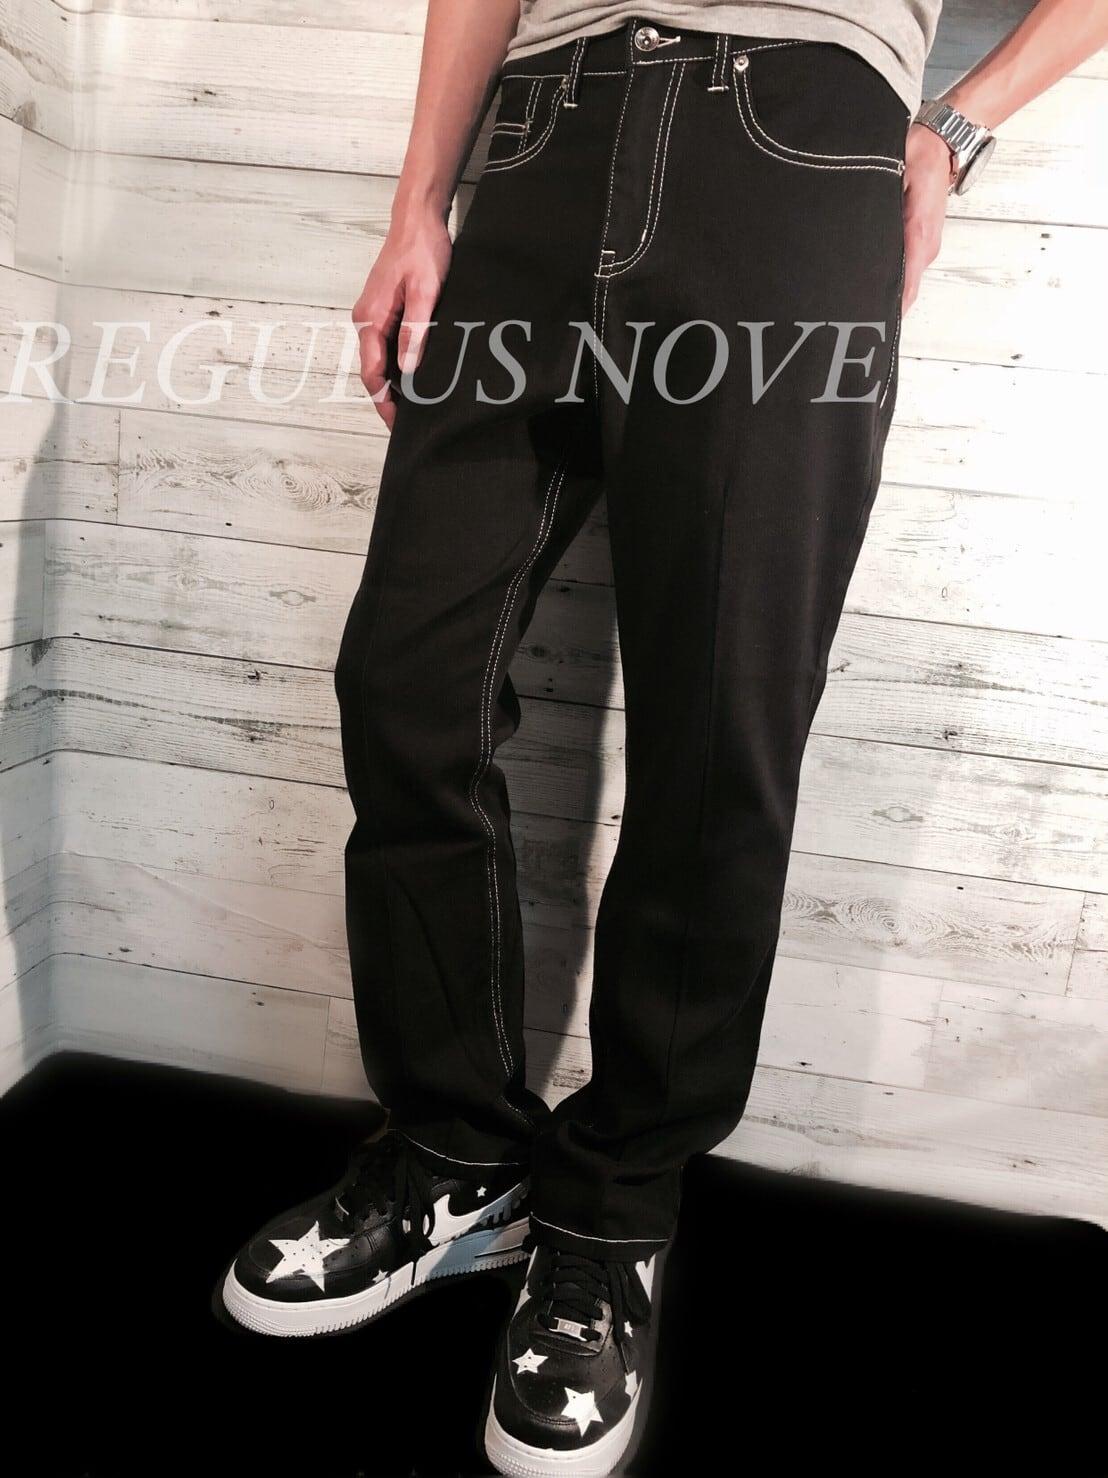 REGULUS NOVE ホワイトステッチフレアパンツ メンズ 男物 紳士服 細身 タイト ボトム 黒 スタッズ 星 シンプル トレンド